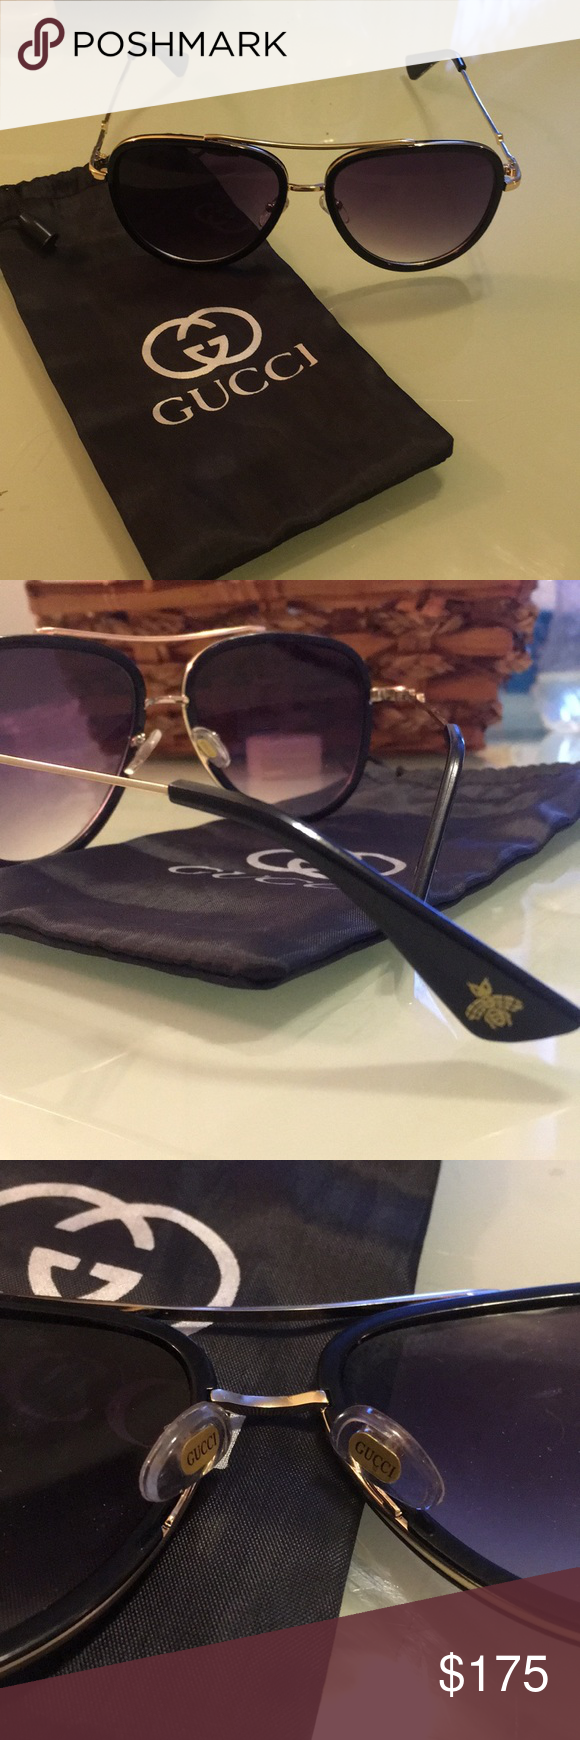 d0ba5cdb188 Gold Black Gucci Sunglasses Gold Black brand new Gucci Sunglasses from saks  fifth originally  244 asking 150 obo